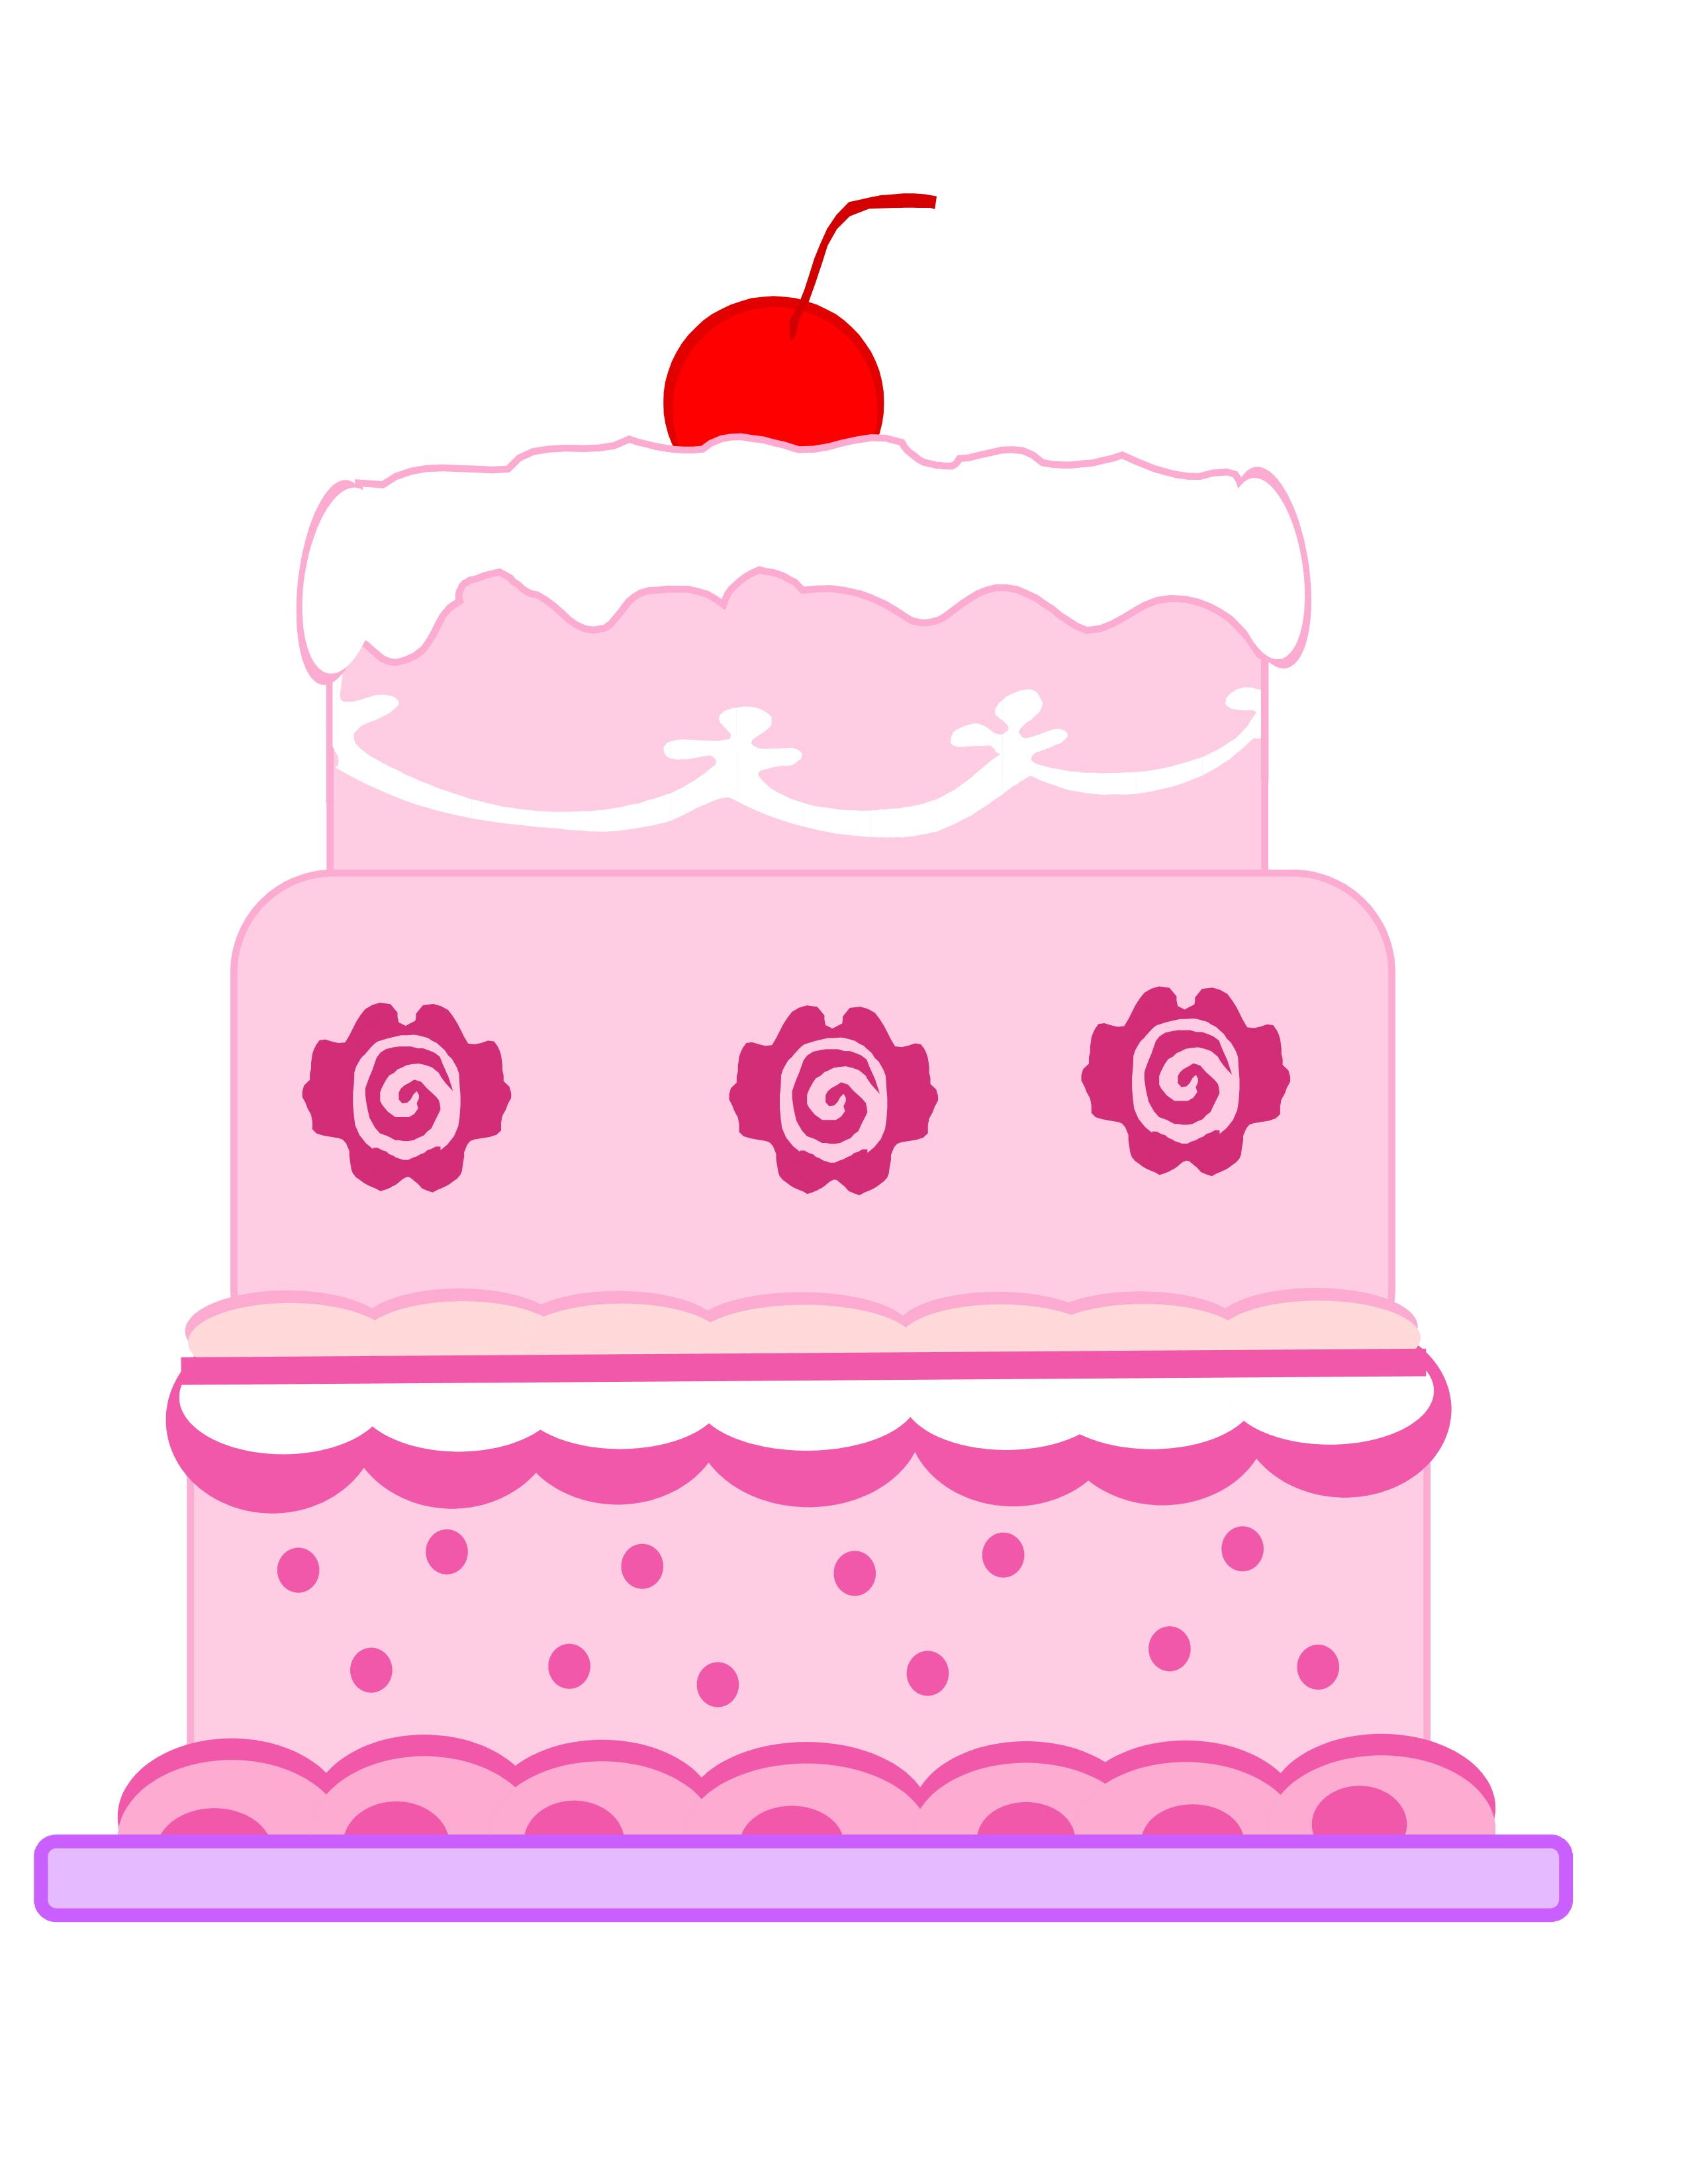 Cake Cartoon Images